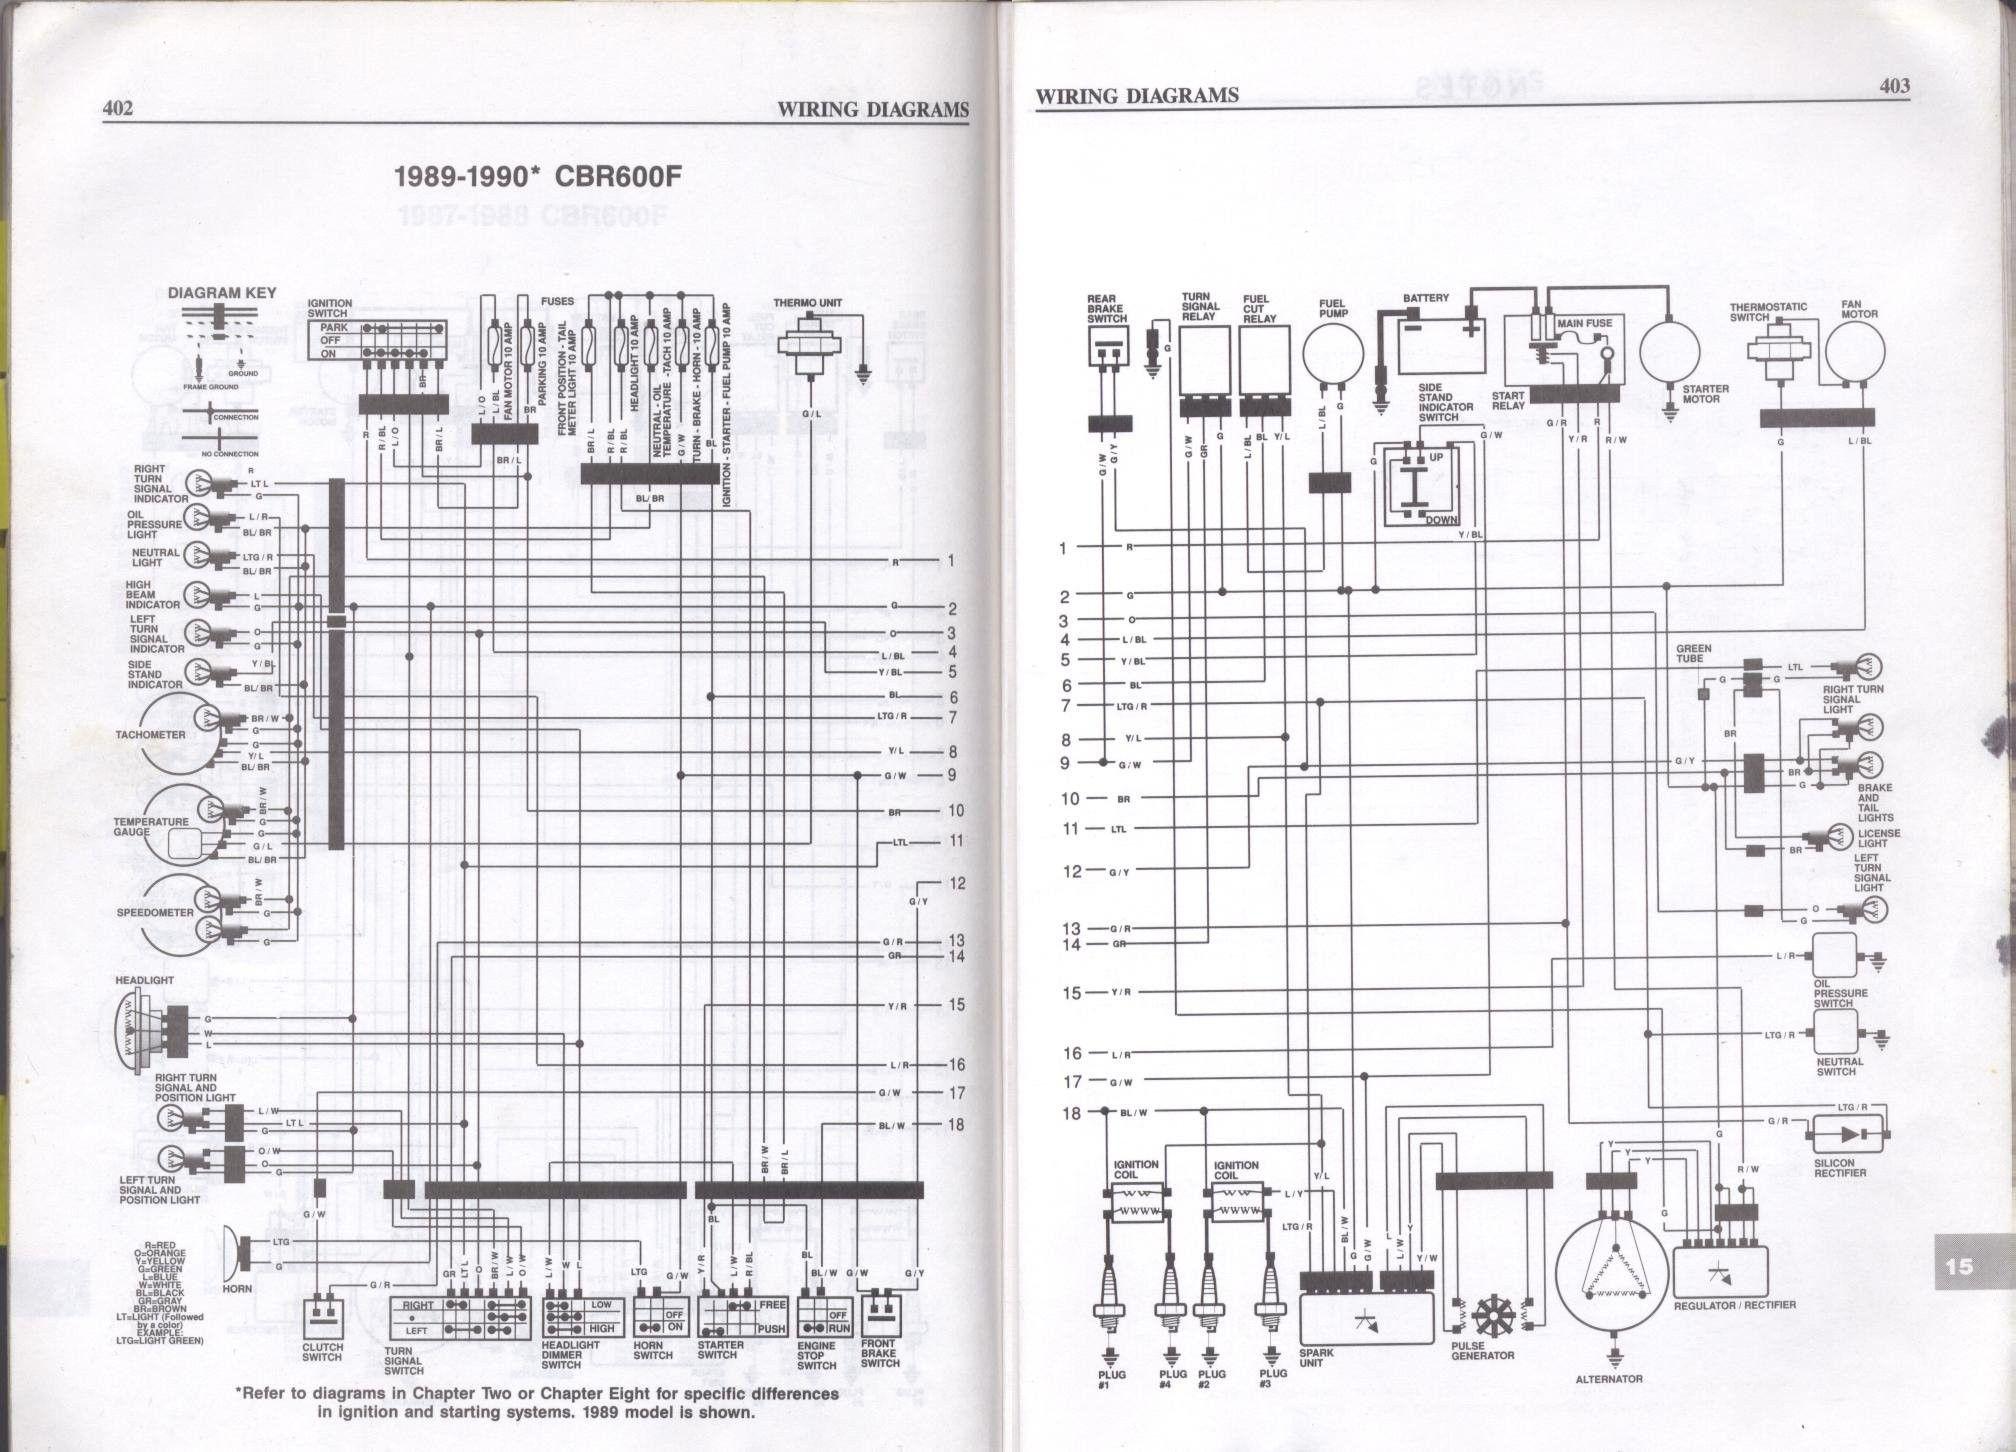 2005 Cbr600rr Wiring Diagram In 2020 Diagram Jeep Grand Cherokee Jeep Grand